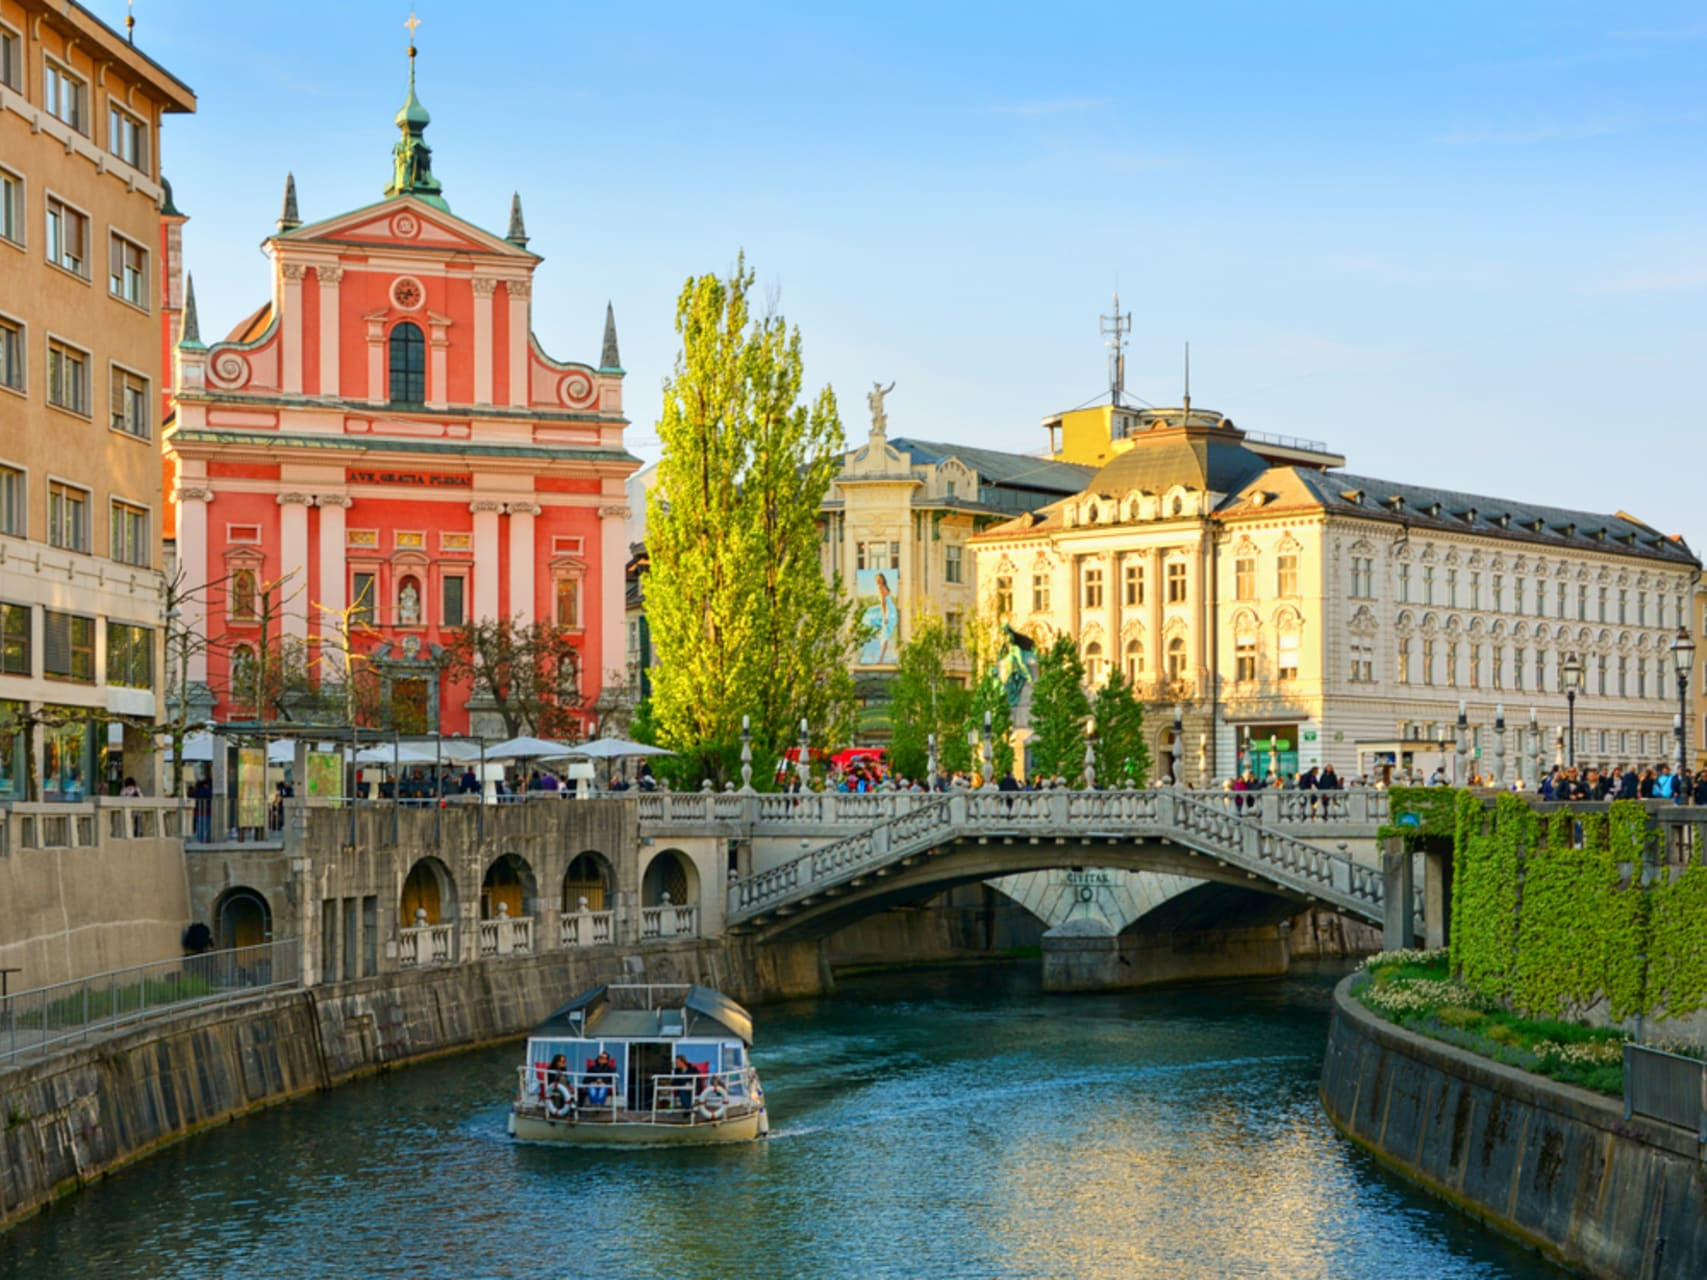 Ljubljana - Bridges that unite us